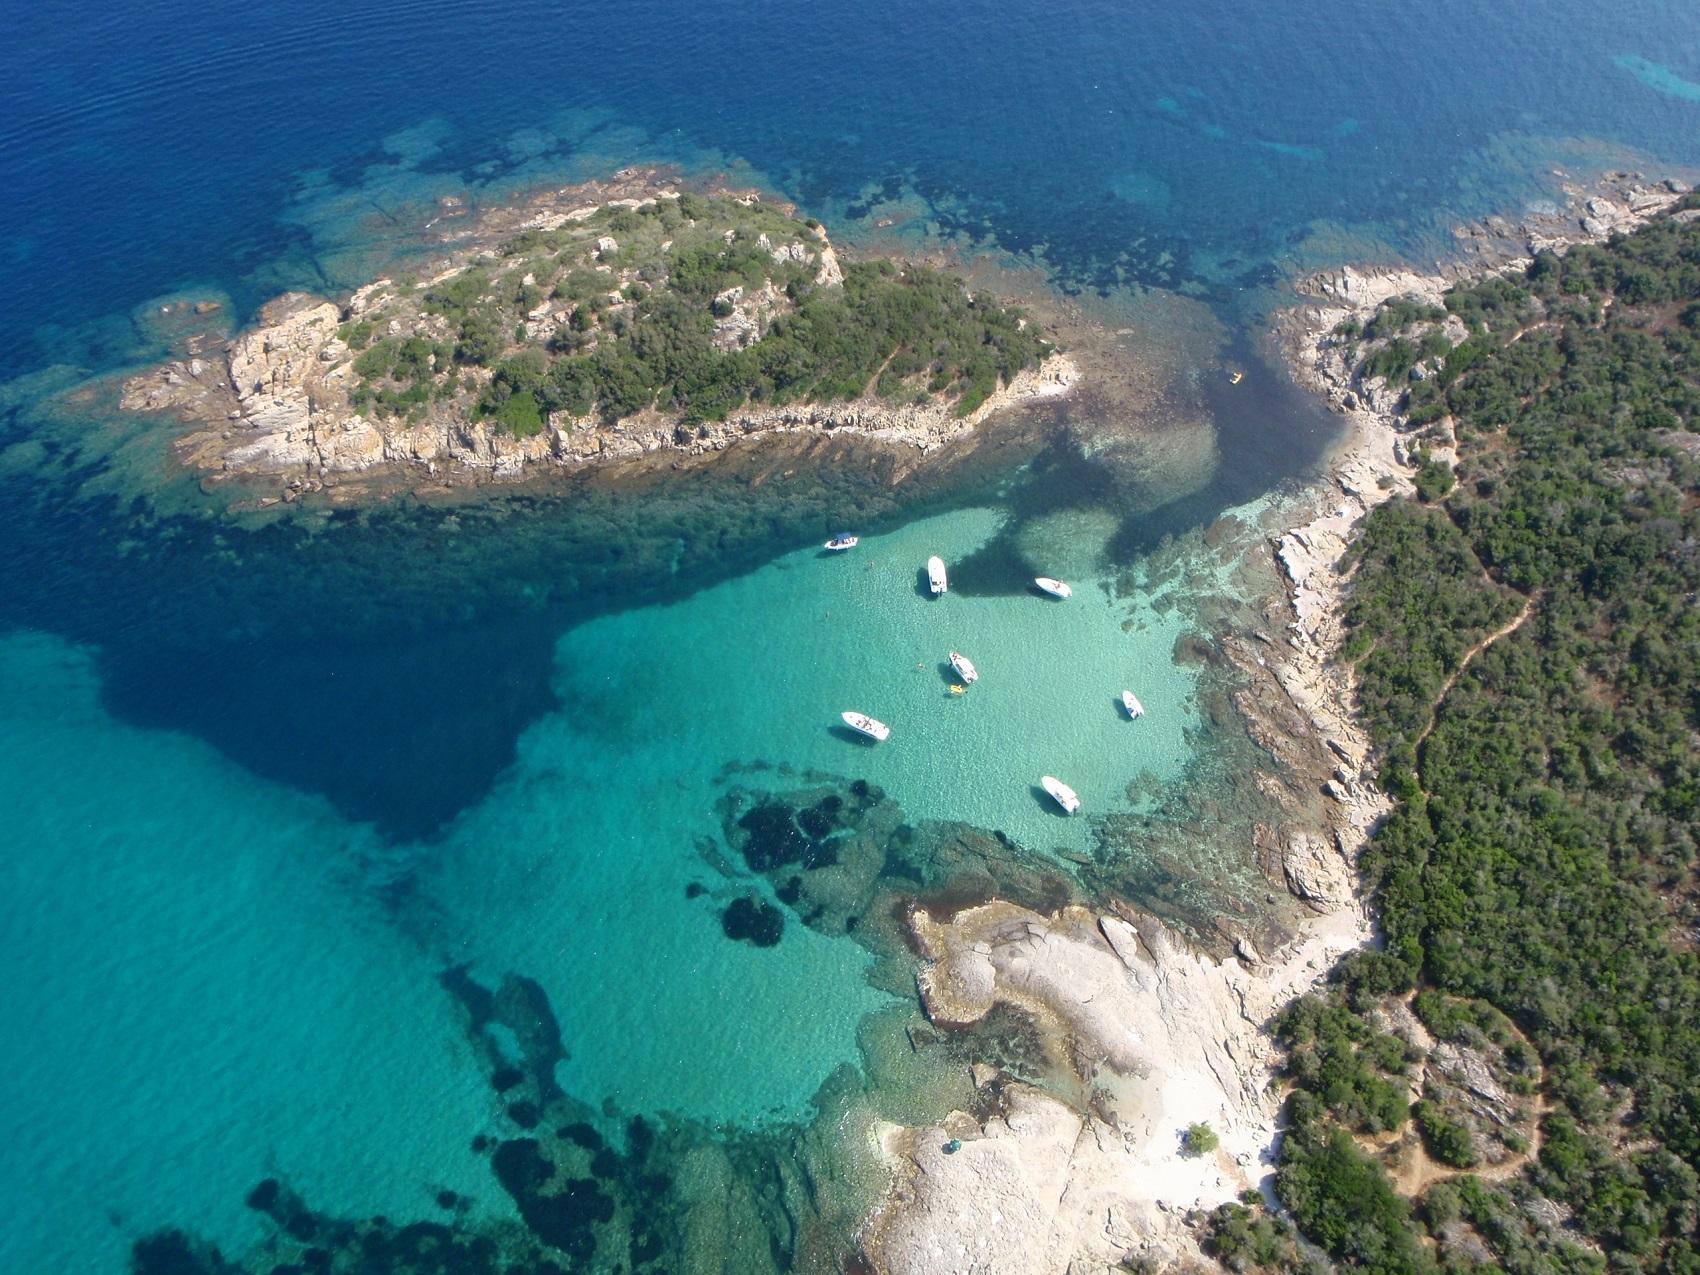 Île de Farina - Les Cerbicales